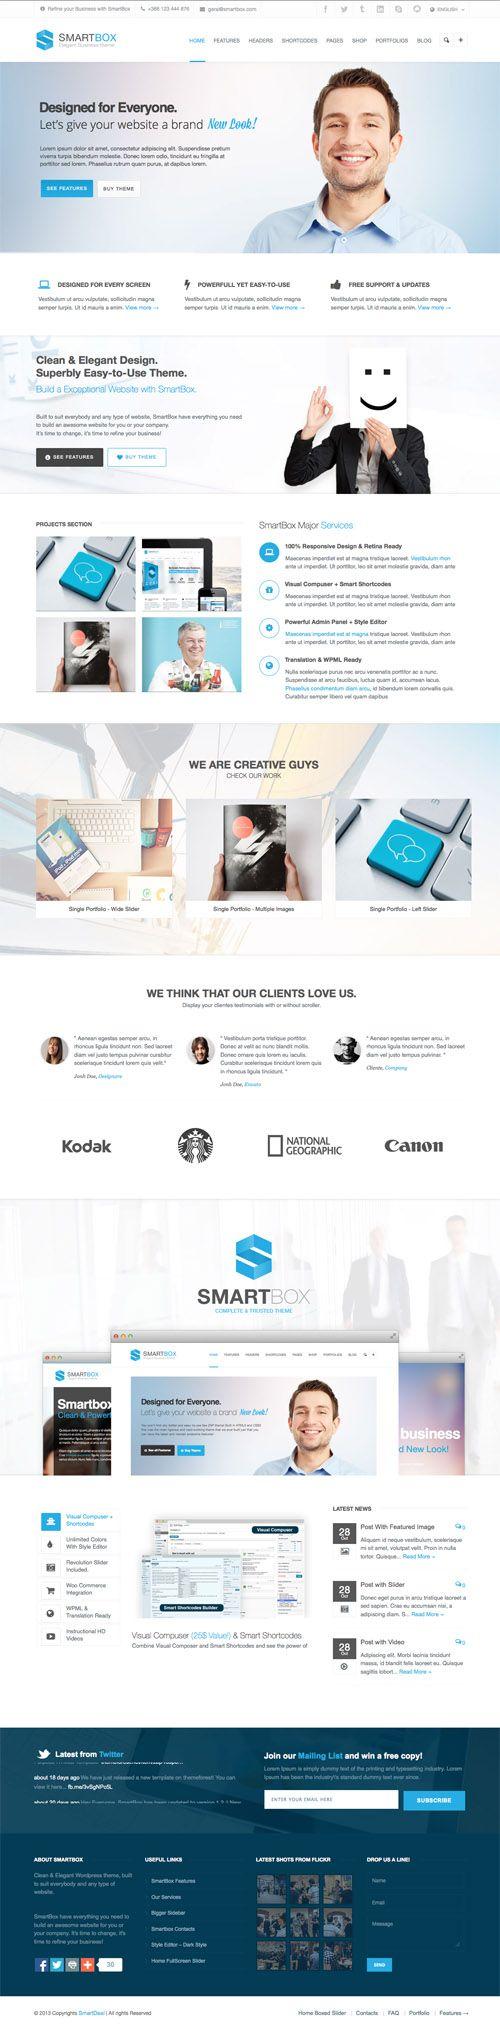 SmartBox PSD Template #psdtemplates #onepagetemplates #businesstemplates #websitetemplates